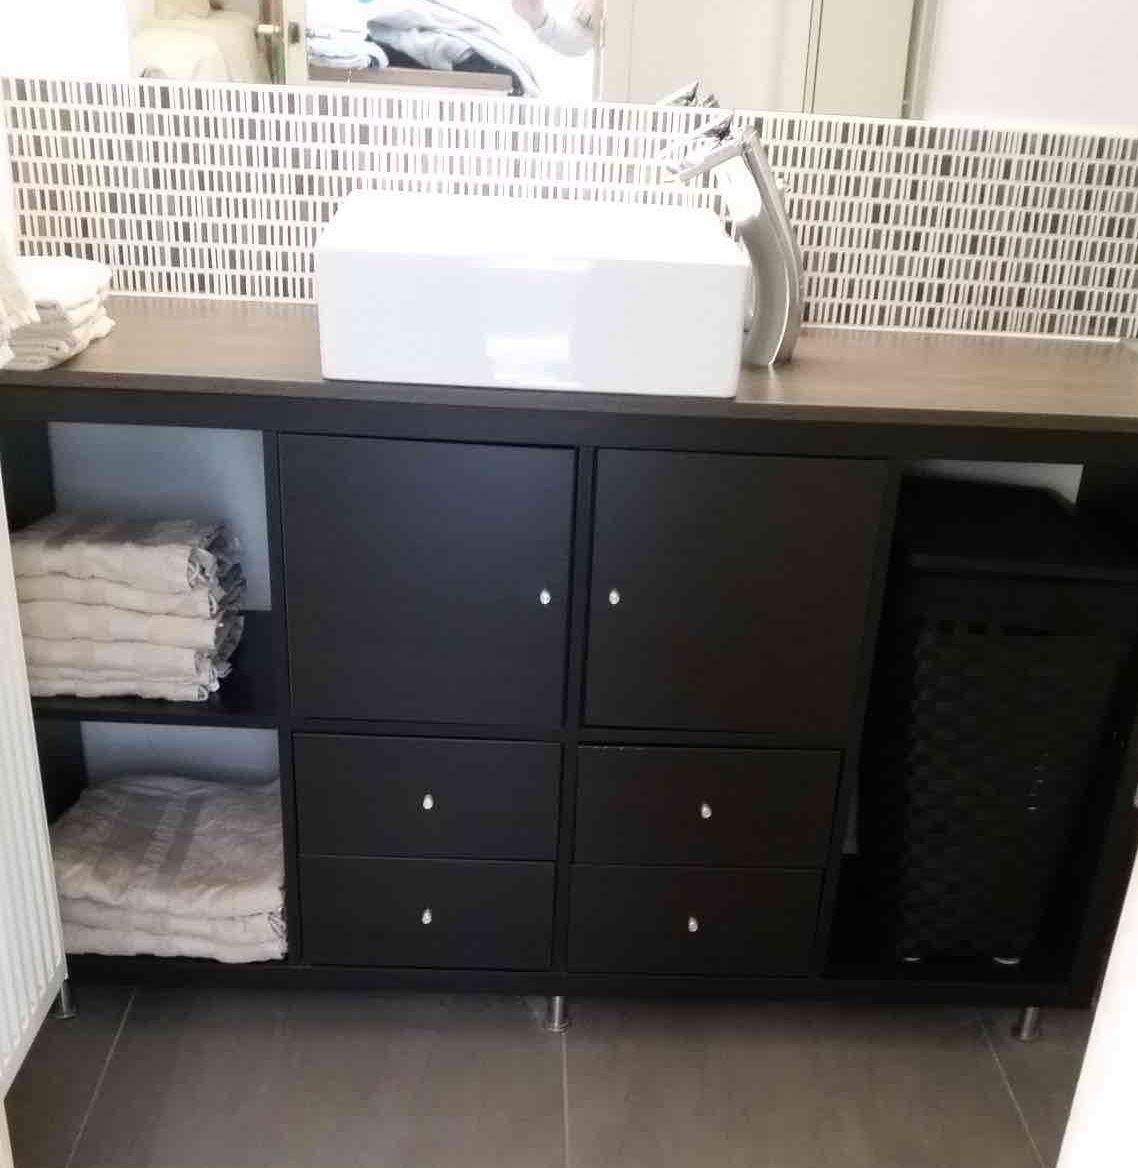 meuble cellier ikea beautiful salle de bains toute blanche avec tagre ikea with meuble cellier. Black Bedroom Furniture Sets. Home Design Ideas